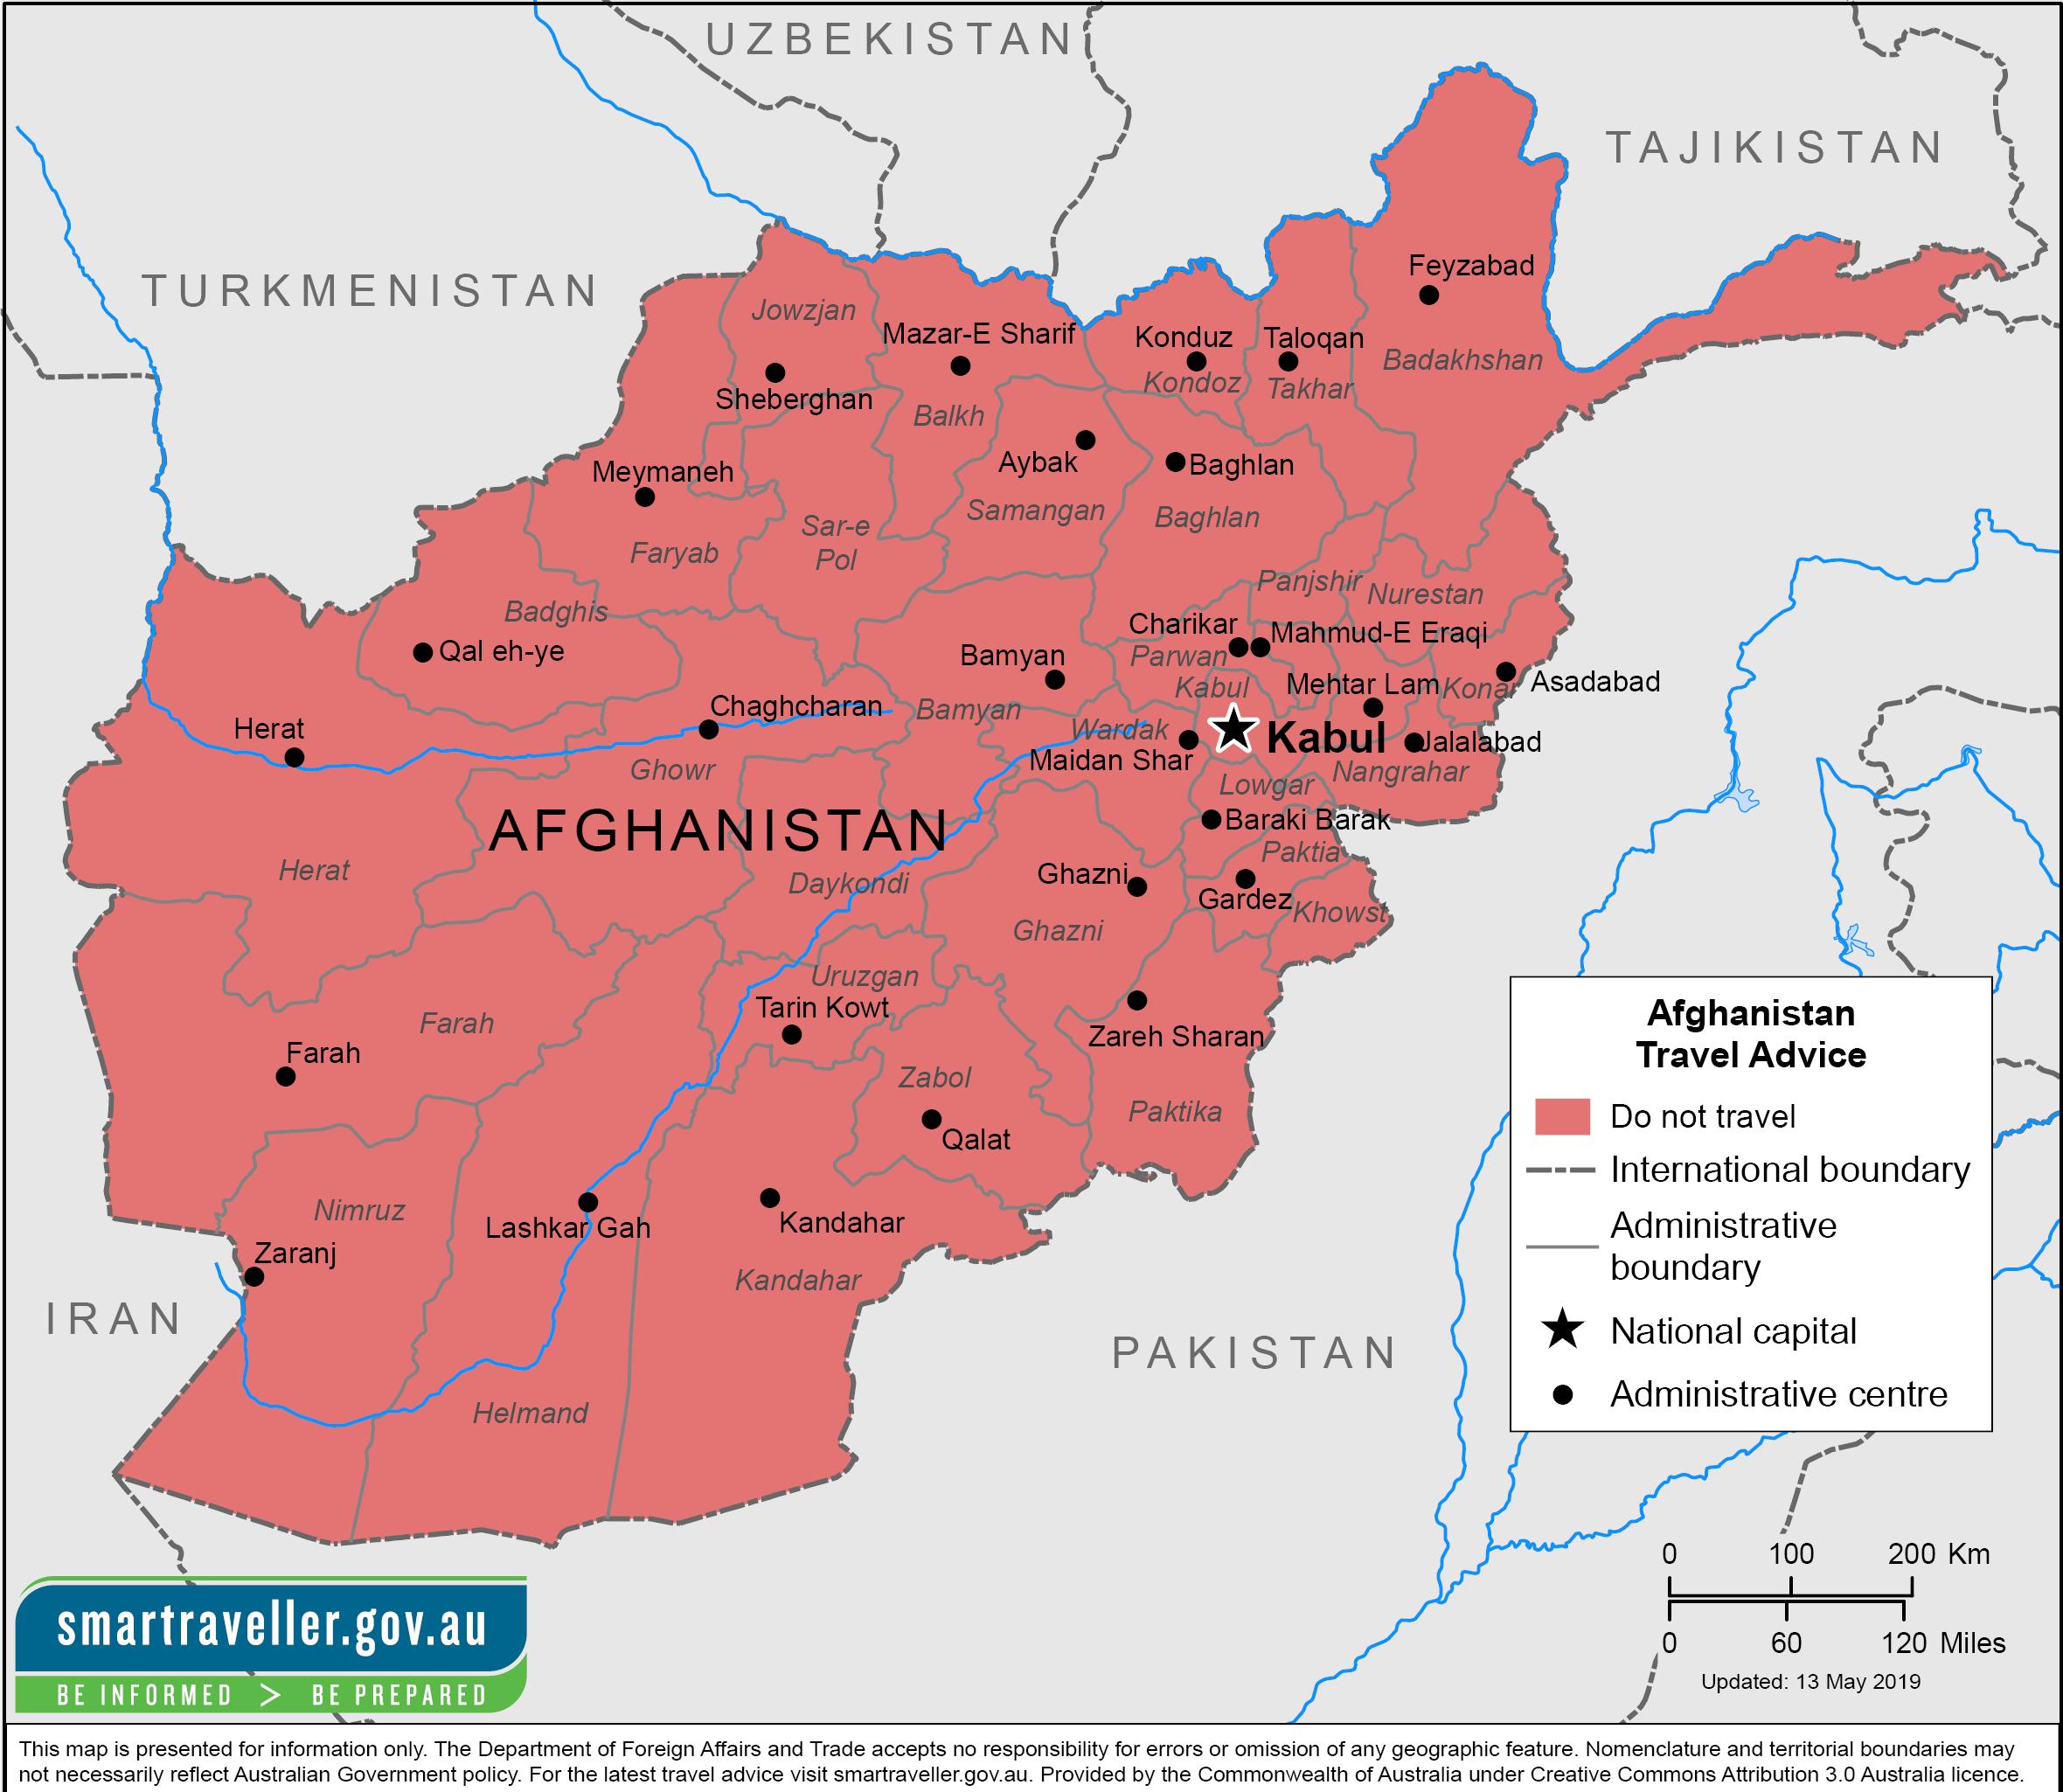 Afghanistan Traveler Information - Travel Advice